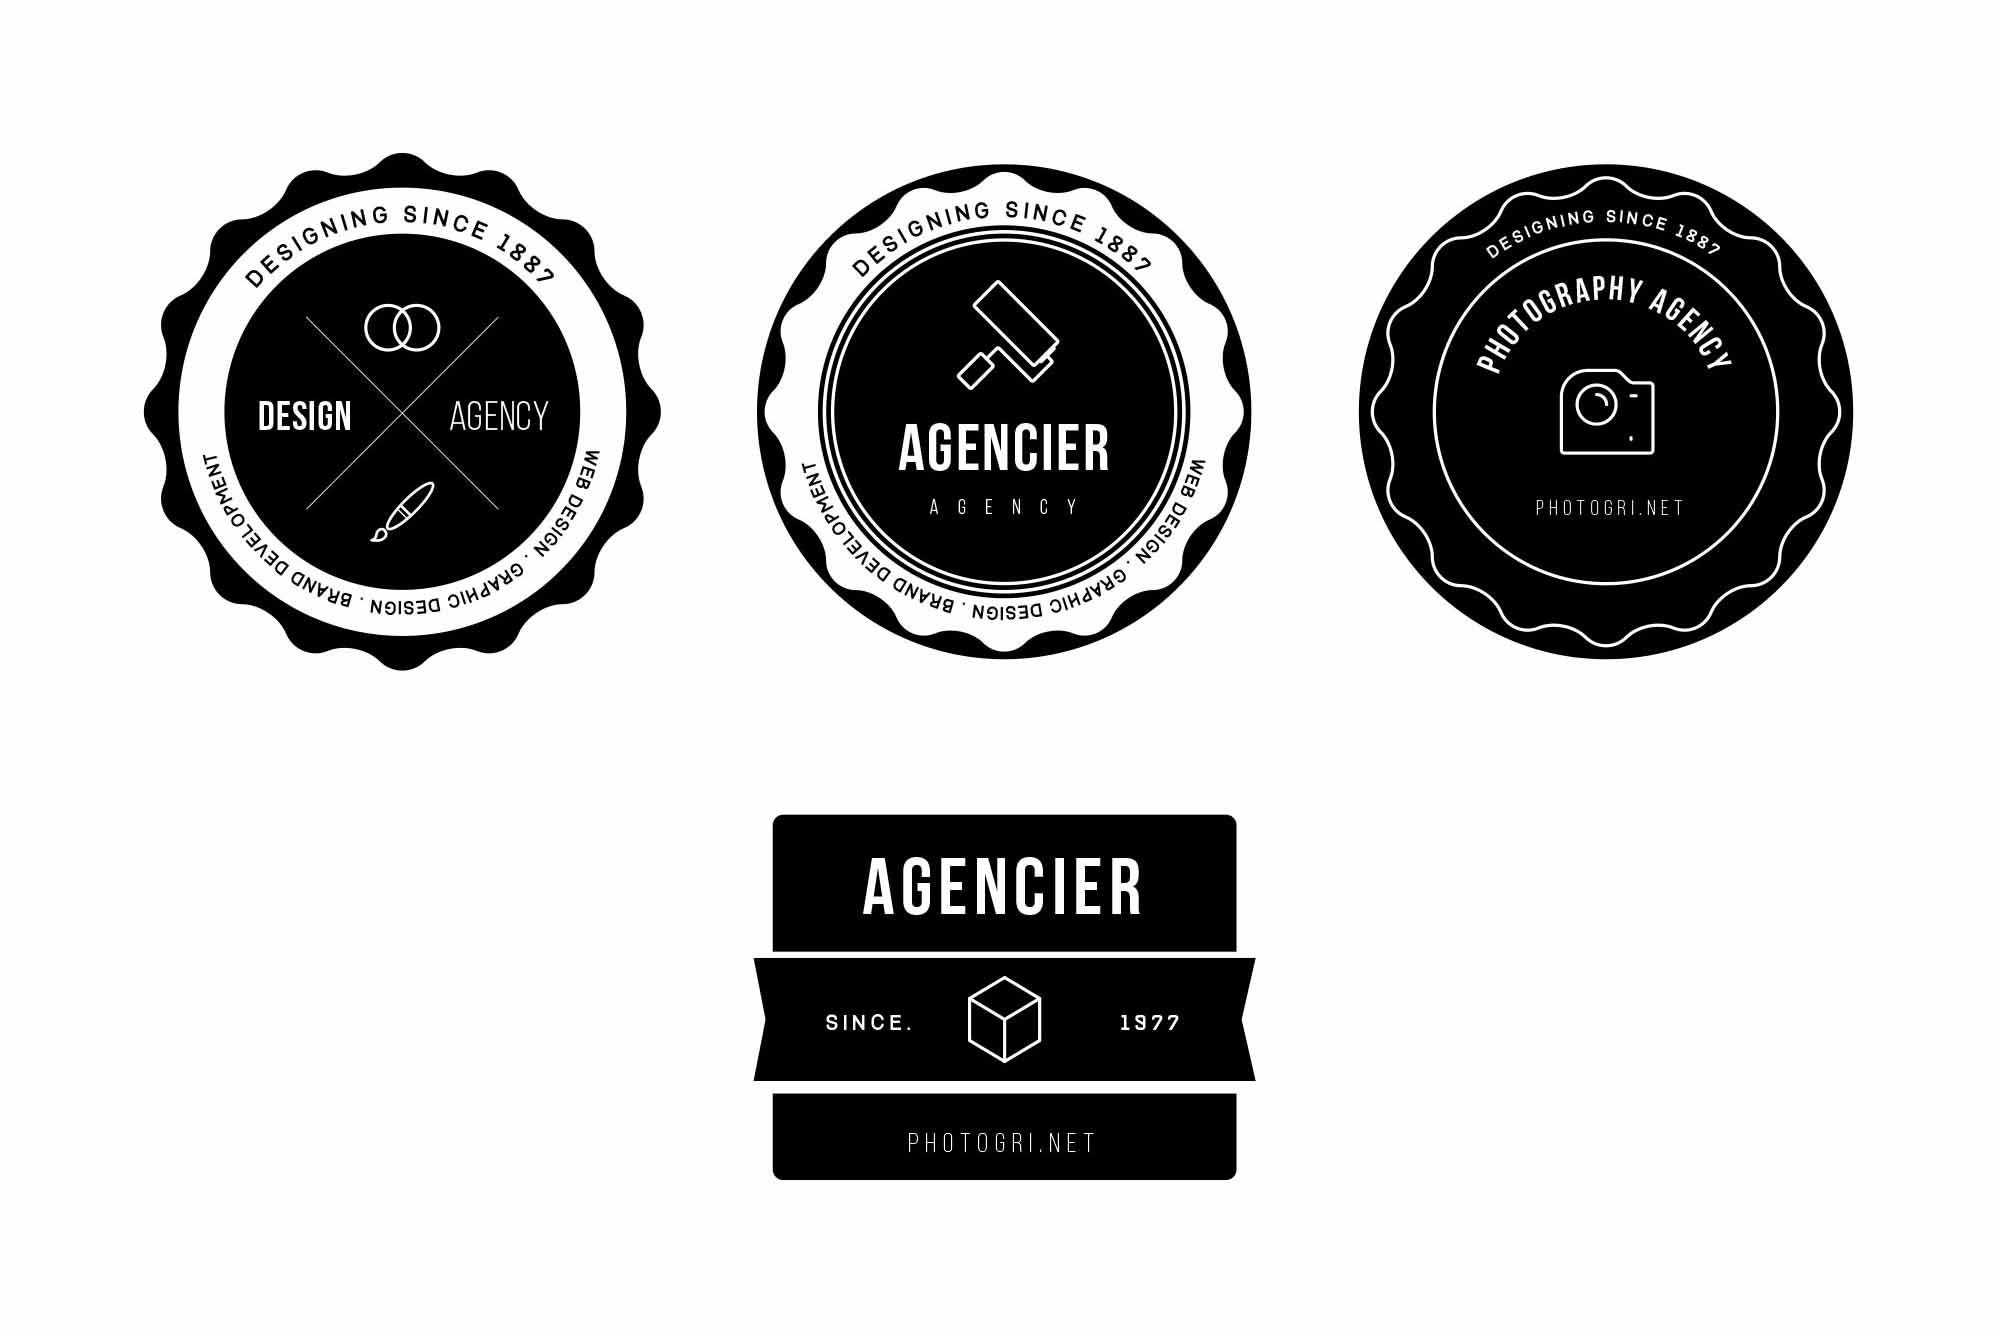 Agency Vector Badges